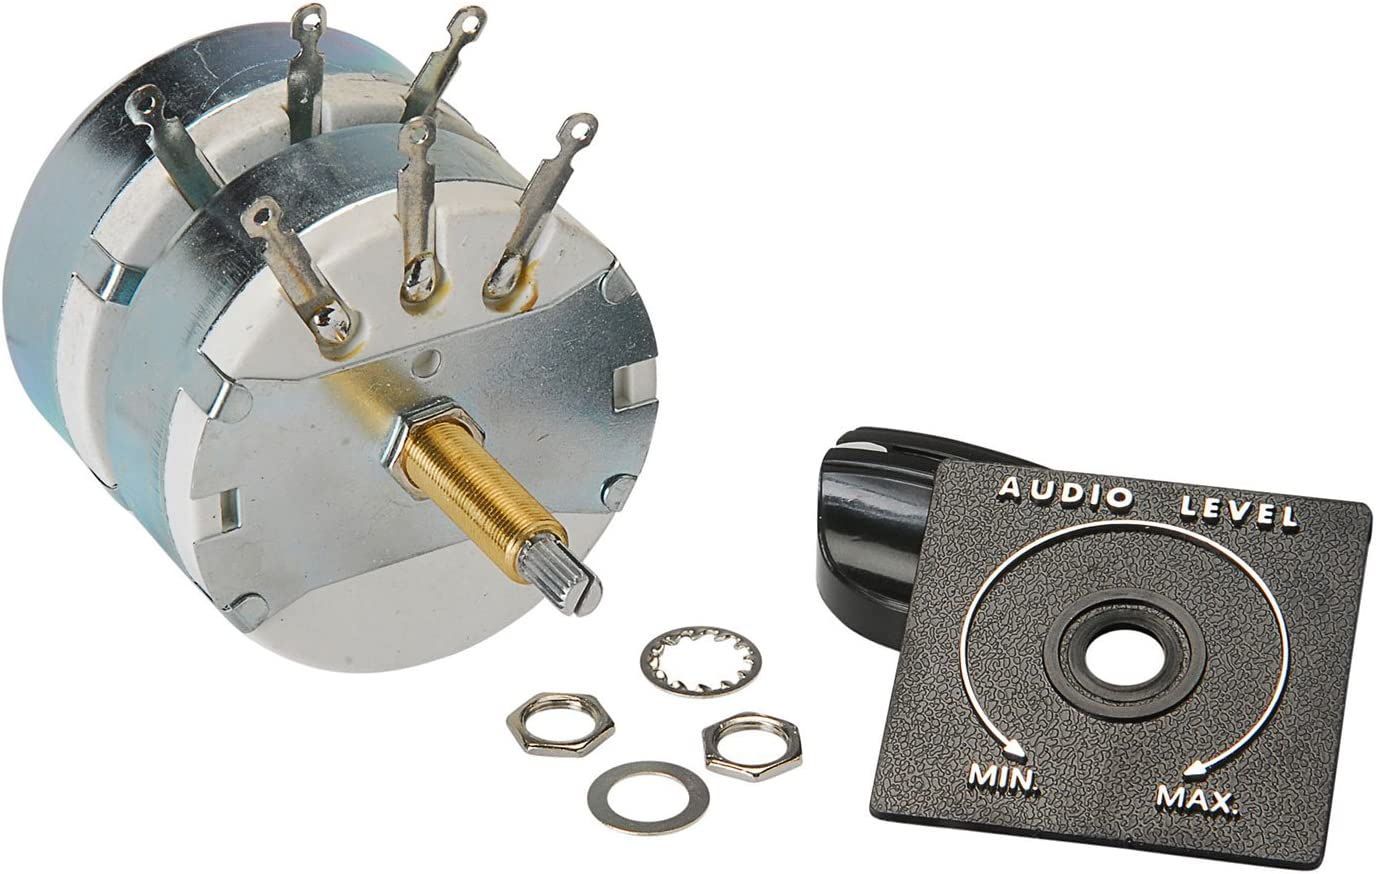 NEW 8-Ohm 15 Watt Speaker Volume Control L-Pad Level Adjustment *USA Seller*